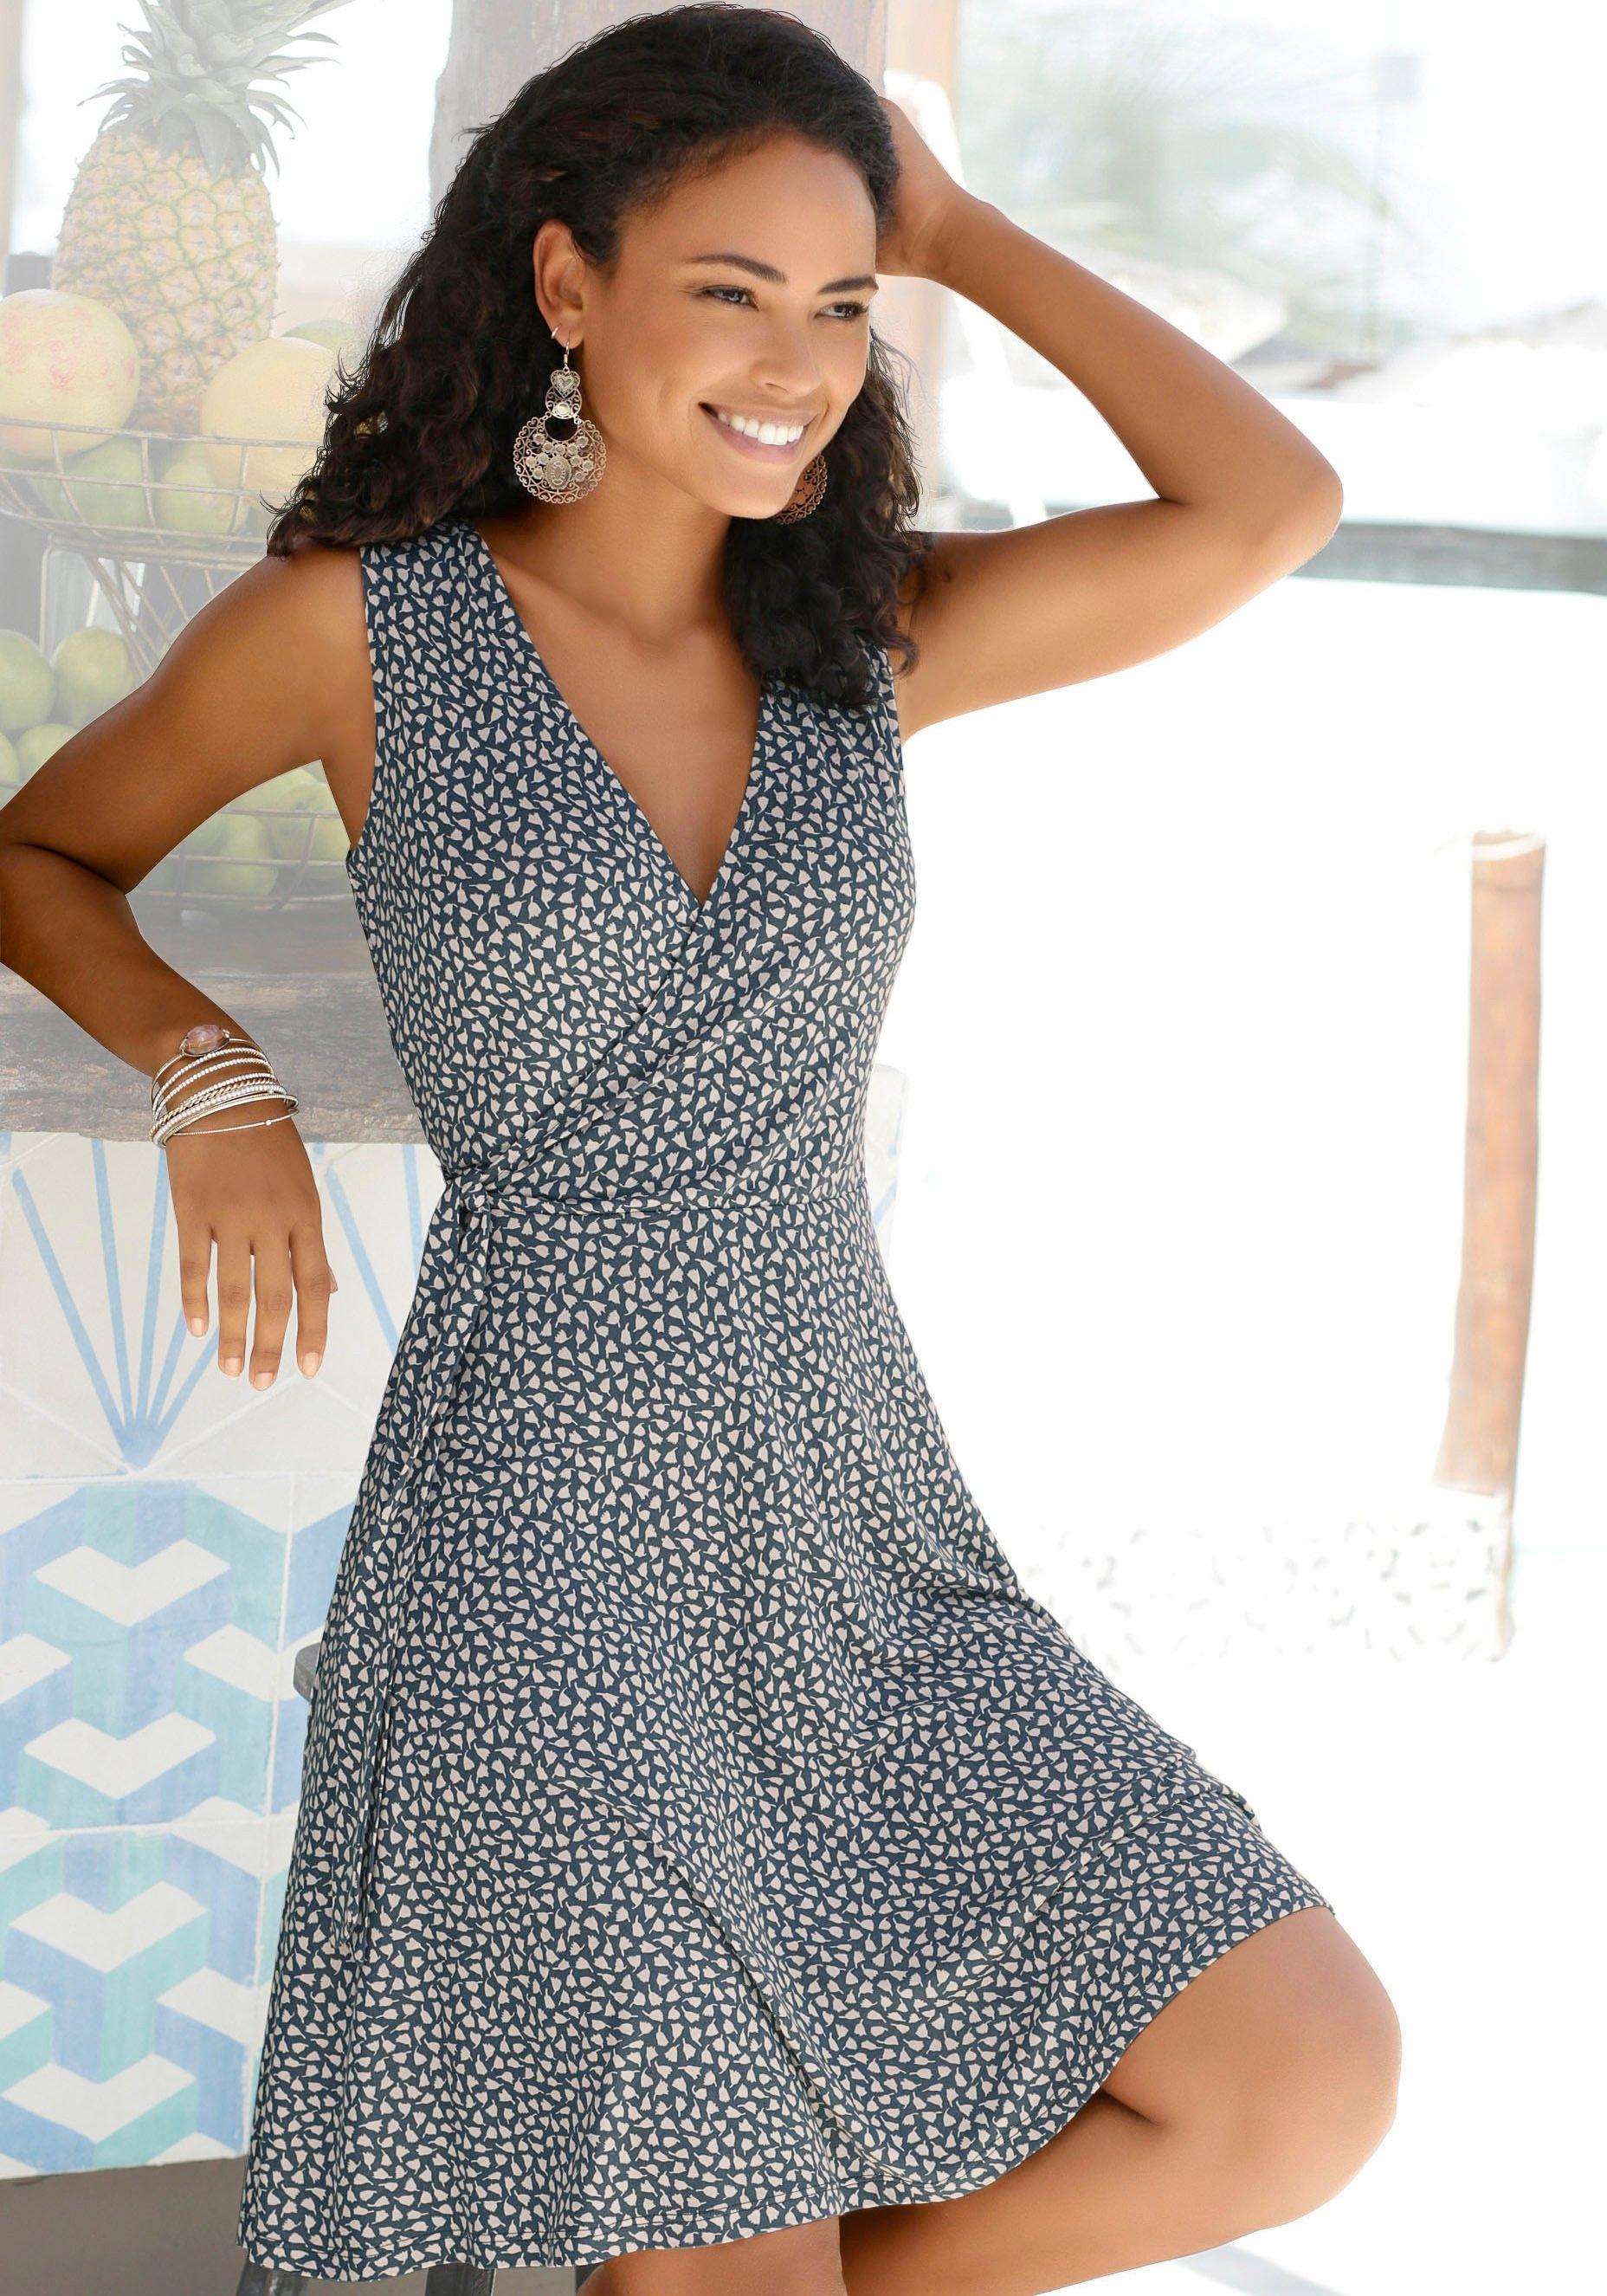 s.Oliver Beachwear s.Oliver RED LABEL Beachwear strandjurk voordelig en veilig online kopen